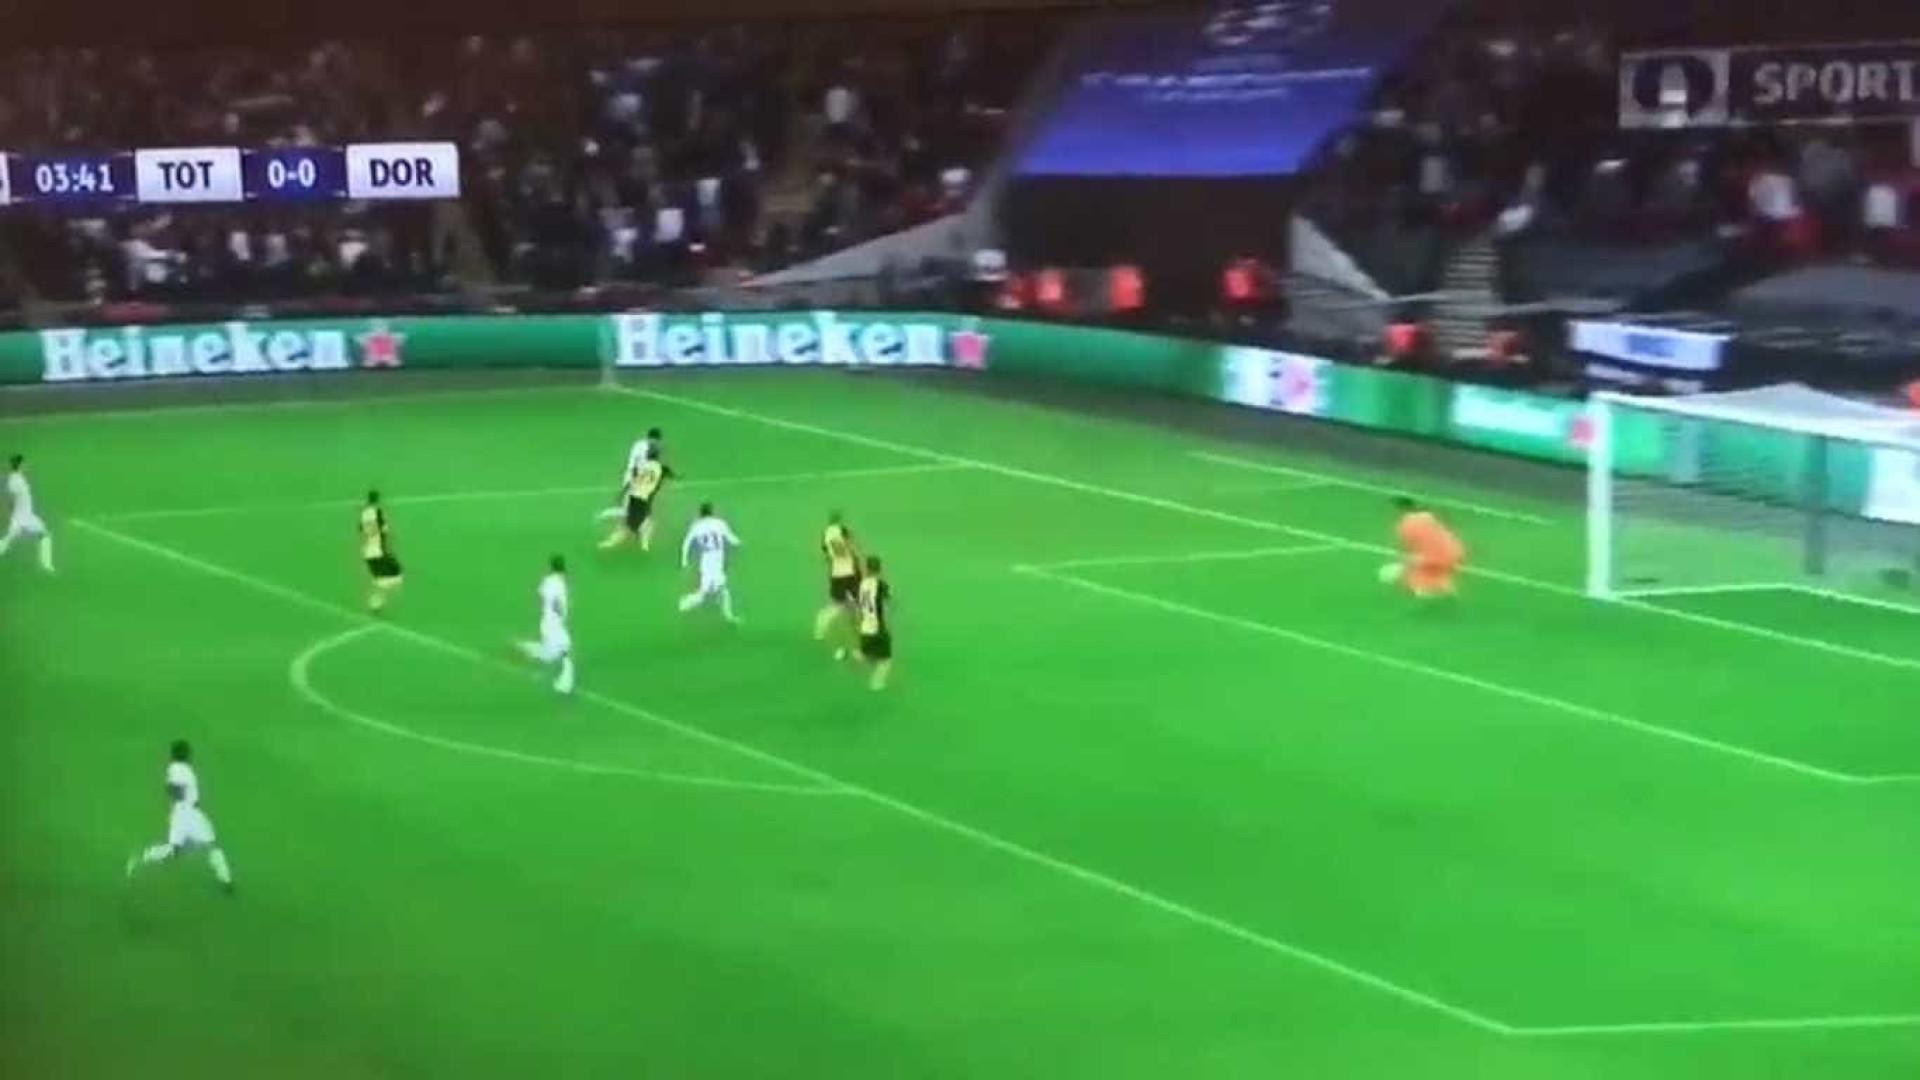 Son Heung Min vira 'gazela' e marca um excelente golo